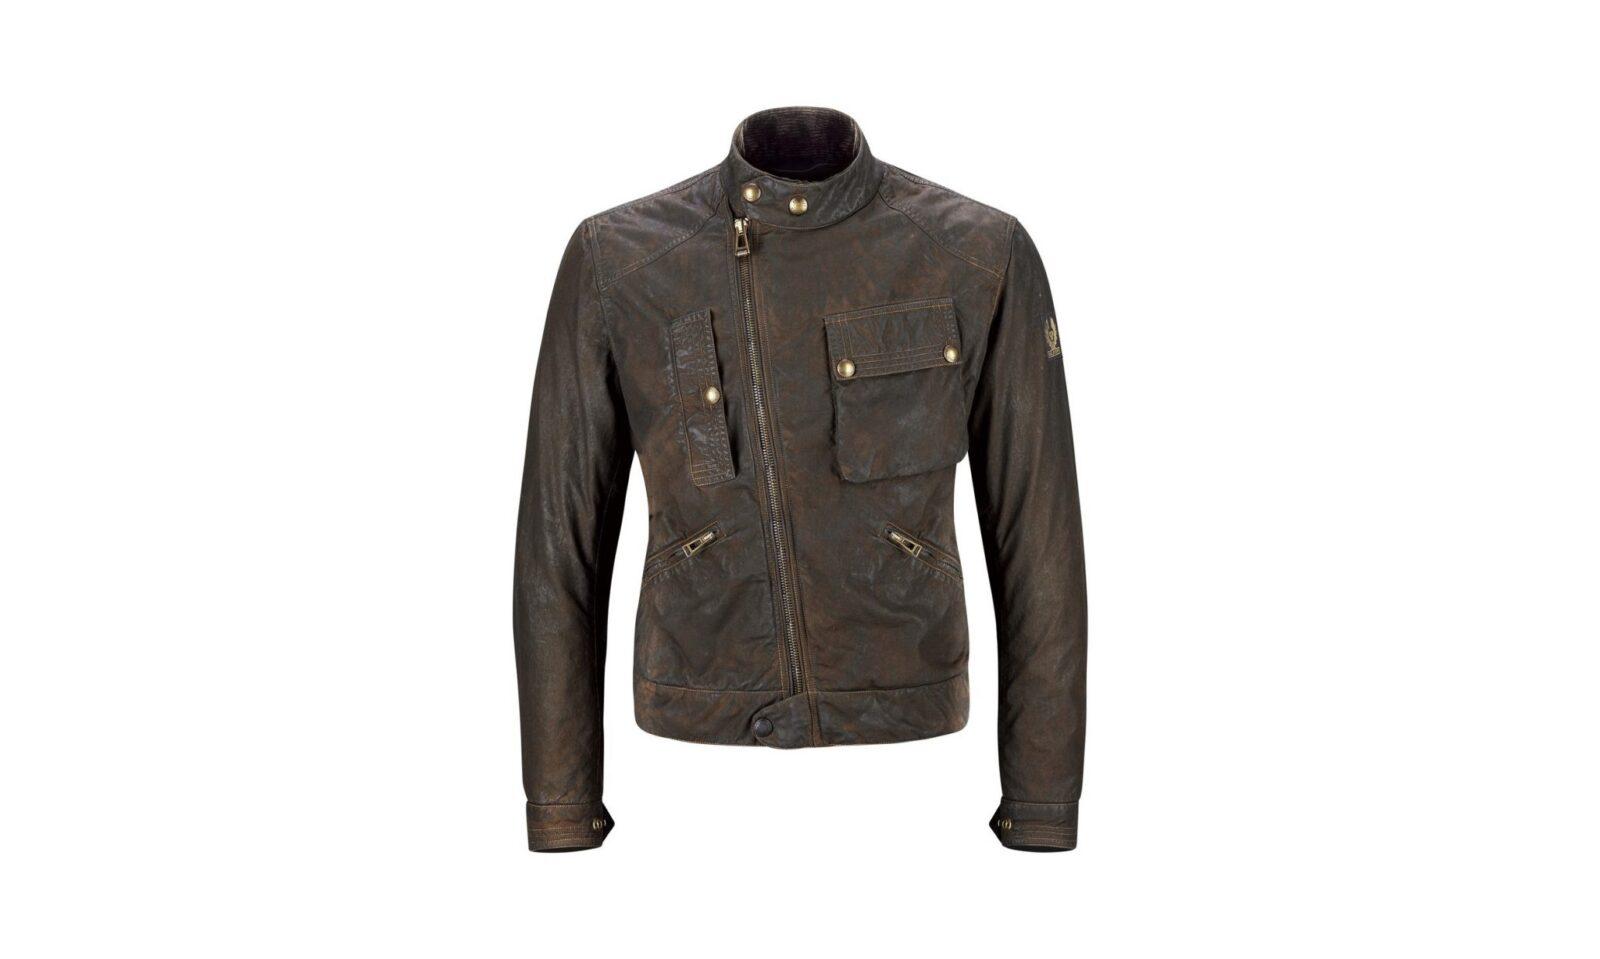 Belstaff Imperial Jacket 1600x959 - Belstaff Imperial Jacket